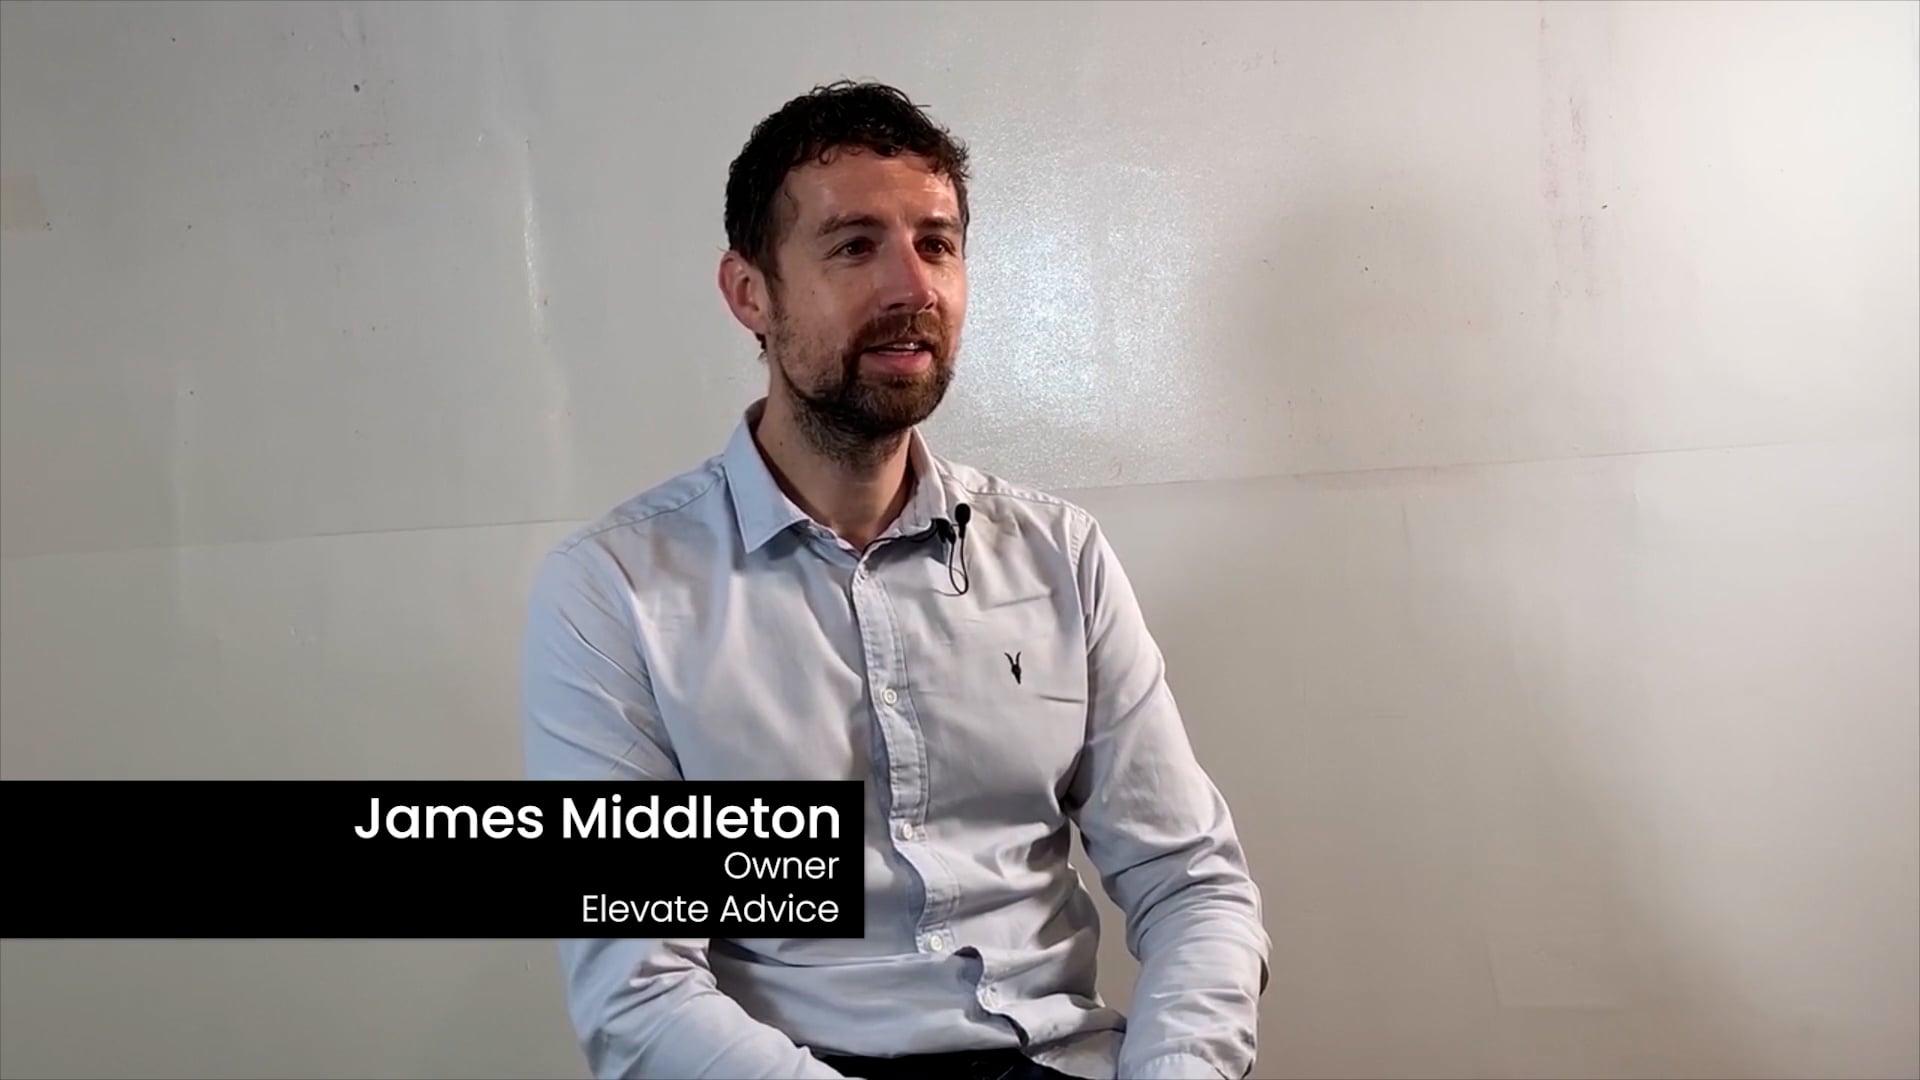 Meet James Middleton, Elevate Advice